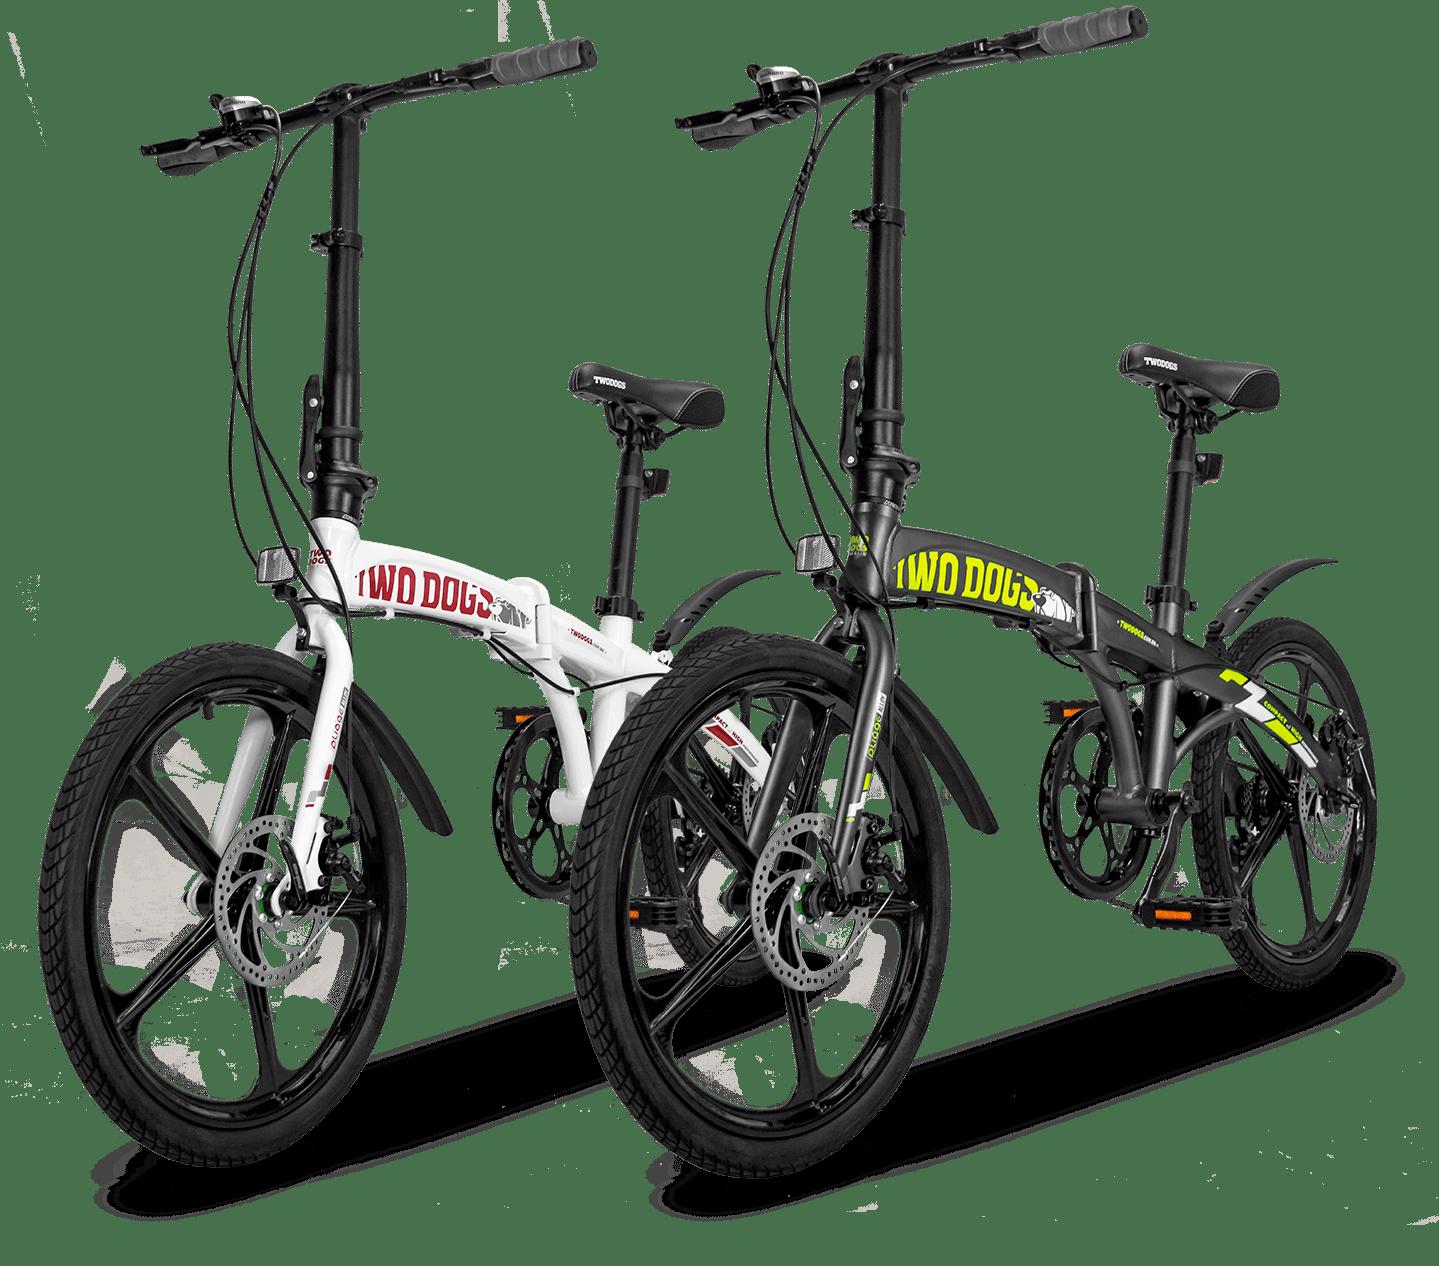 cores bicicleta dobrável alloy Two Dogs